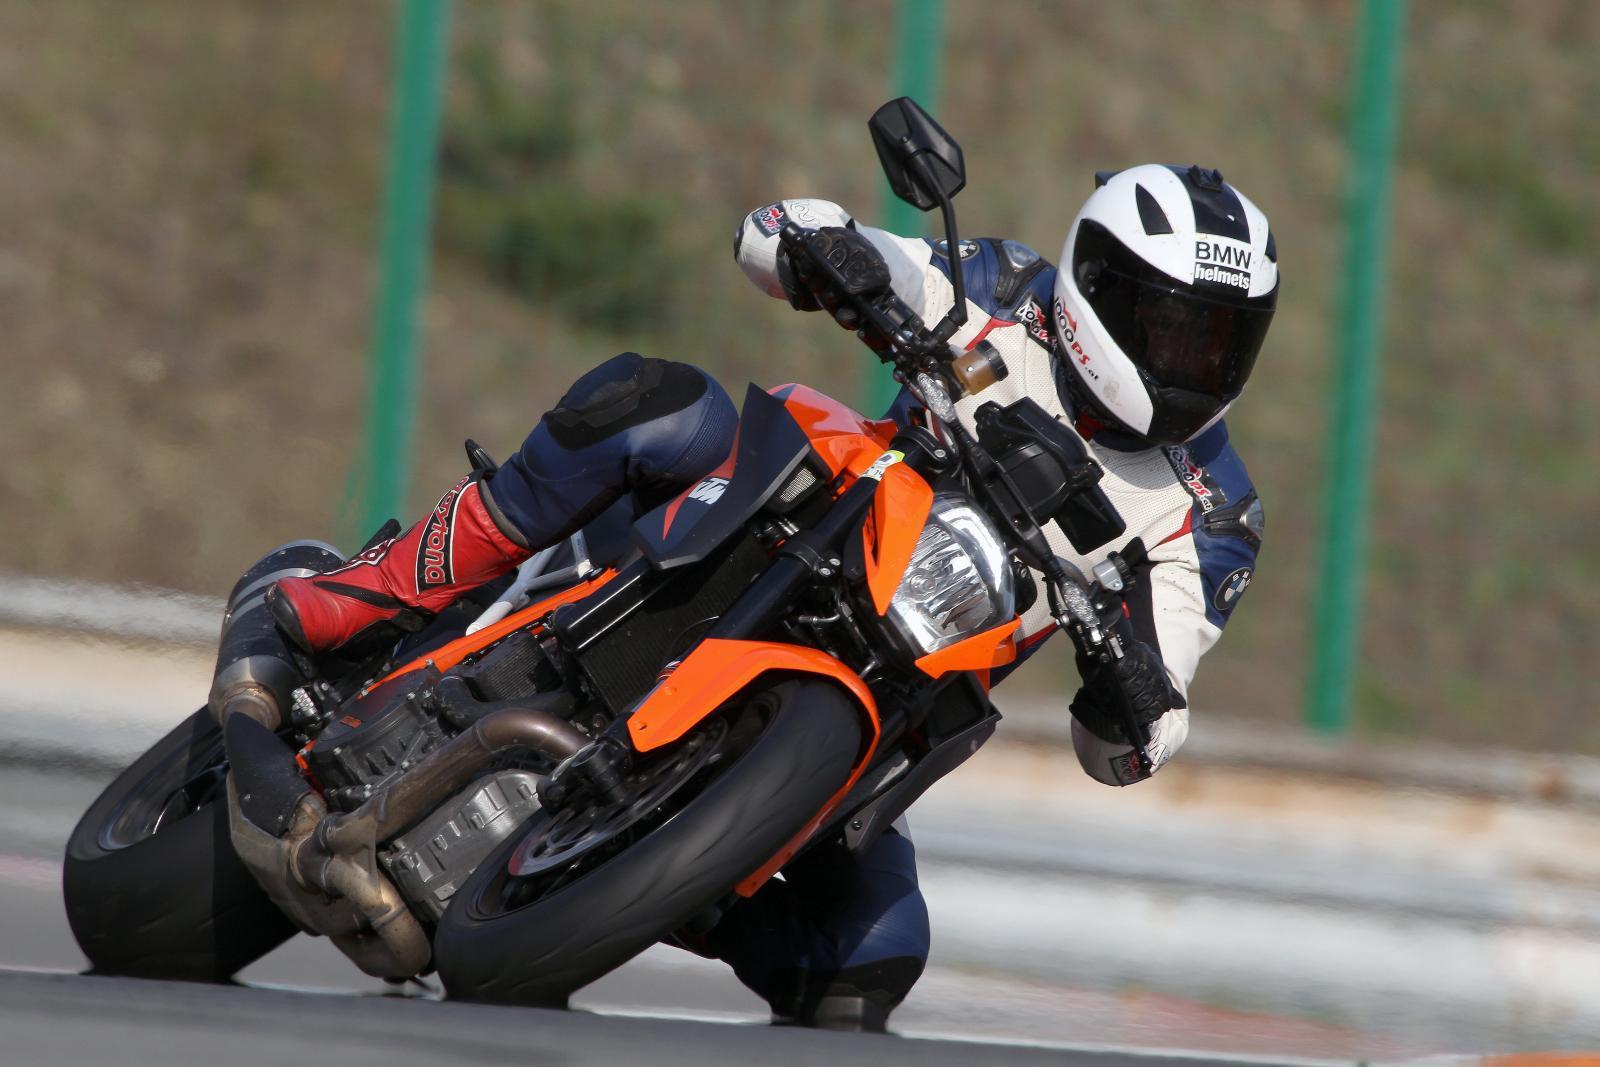 http://www.motorrad-bilder.at/slideshows/291/010872/bmw_s1000r_kawasaki_z1000_action_11.jpg